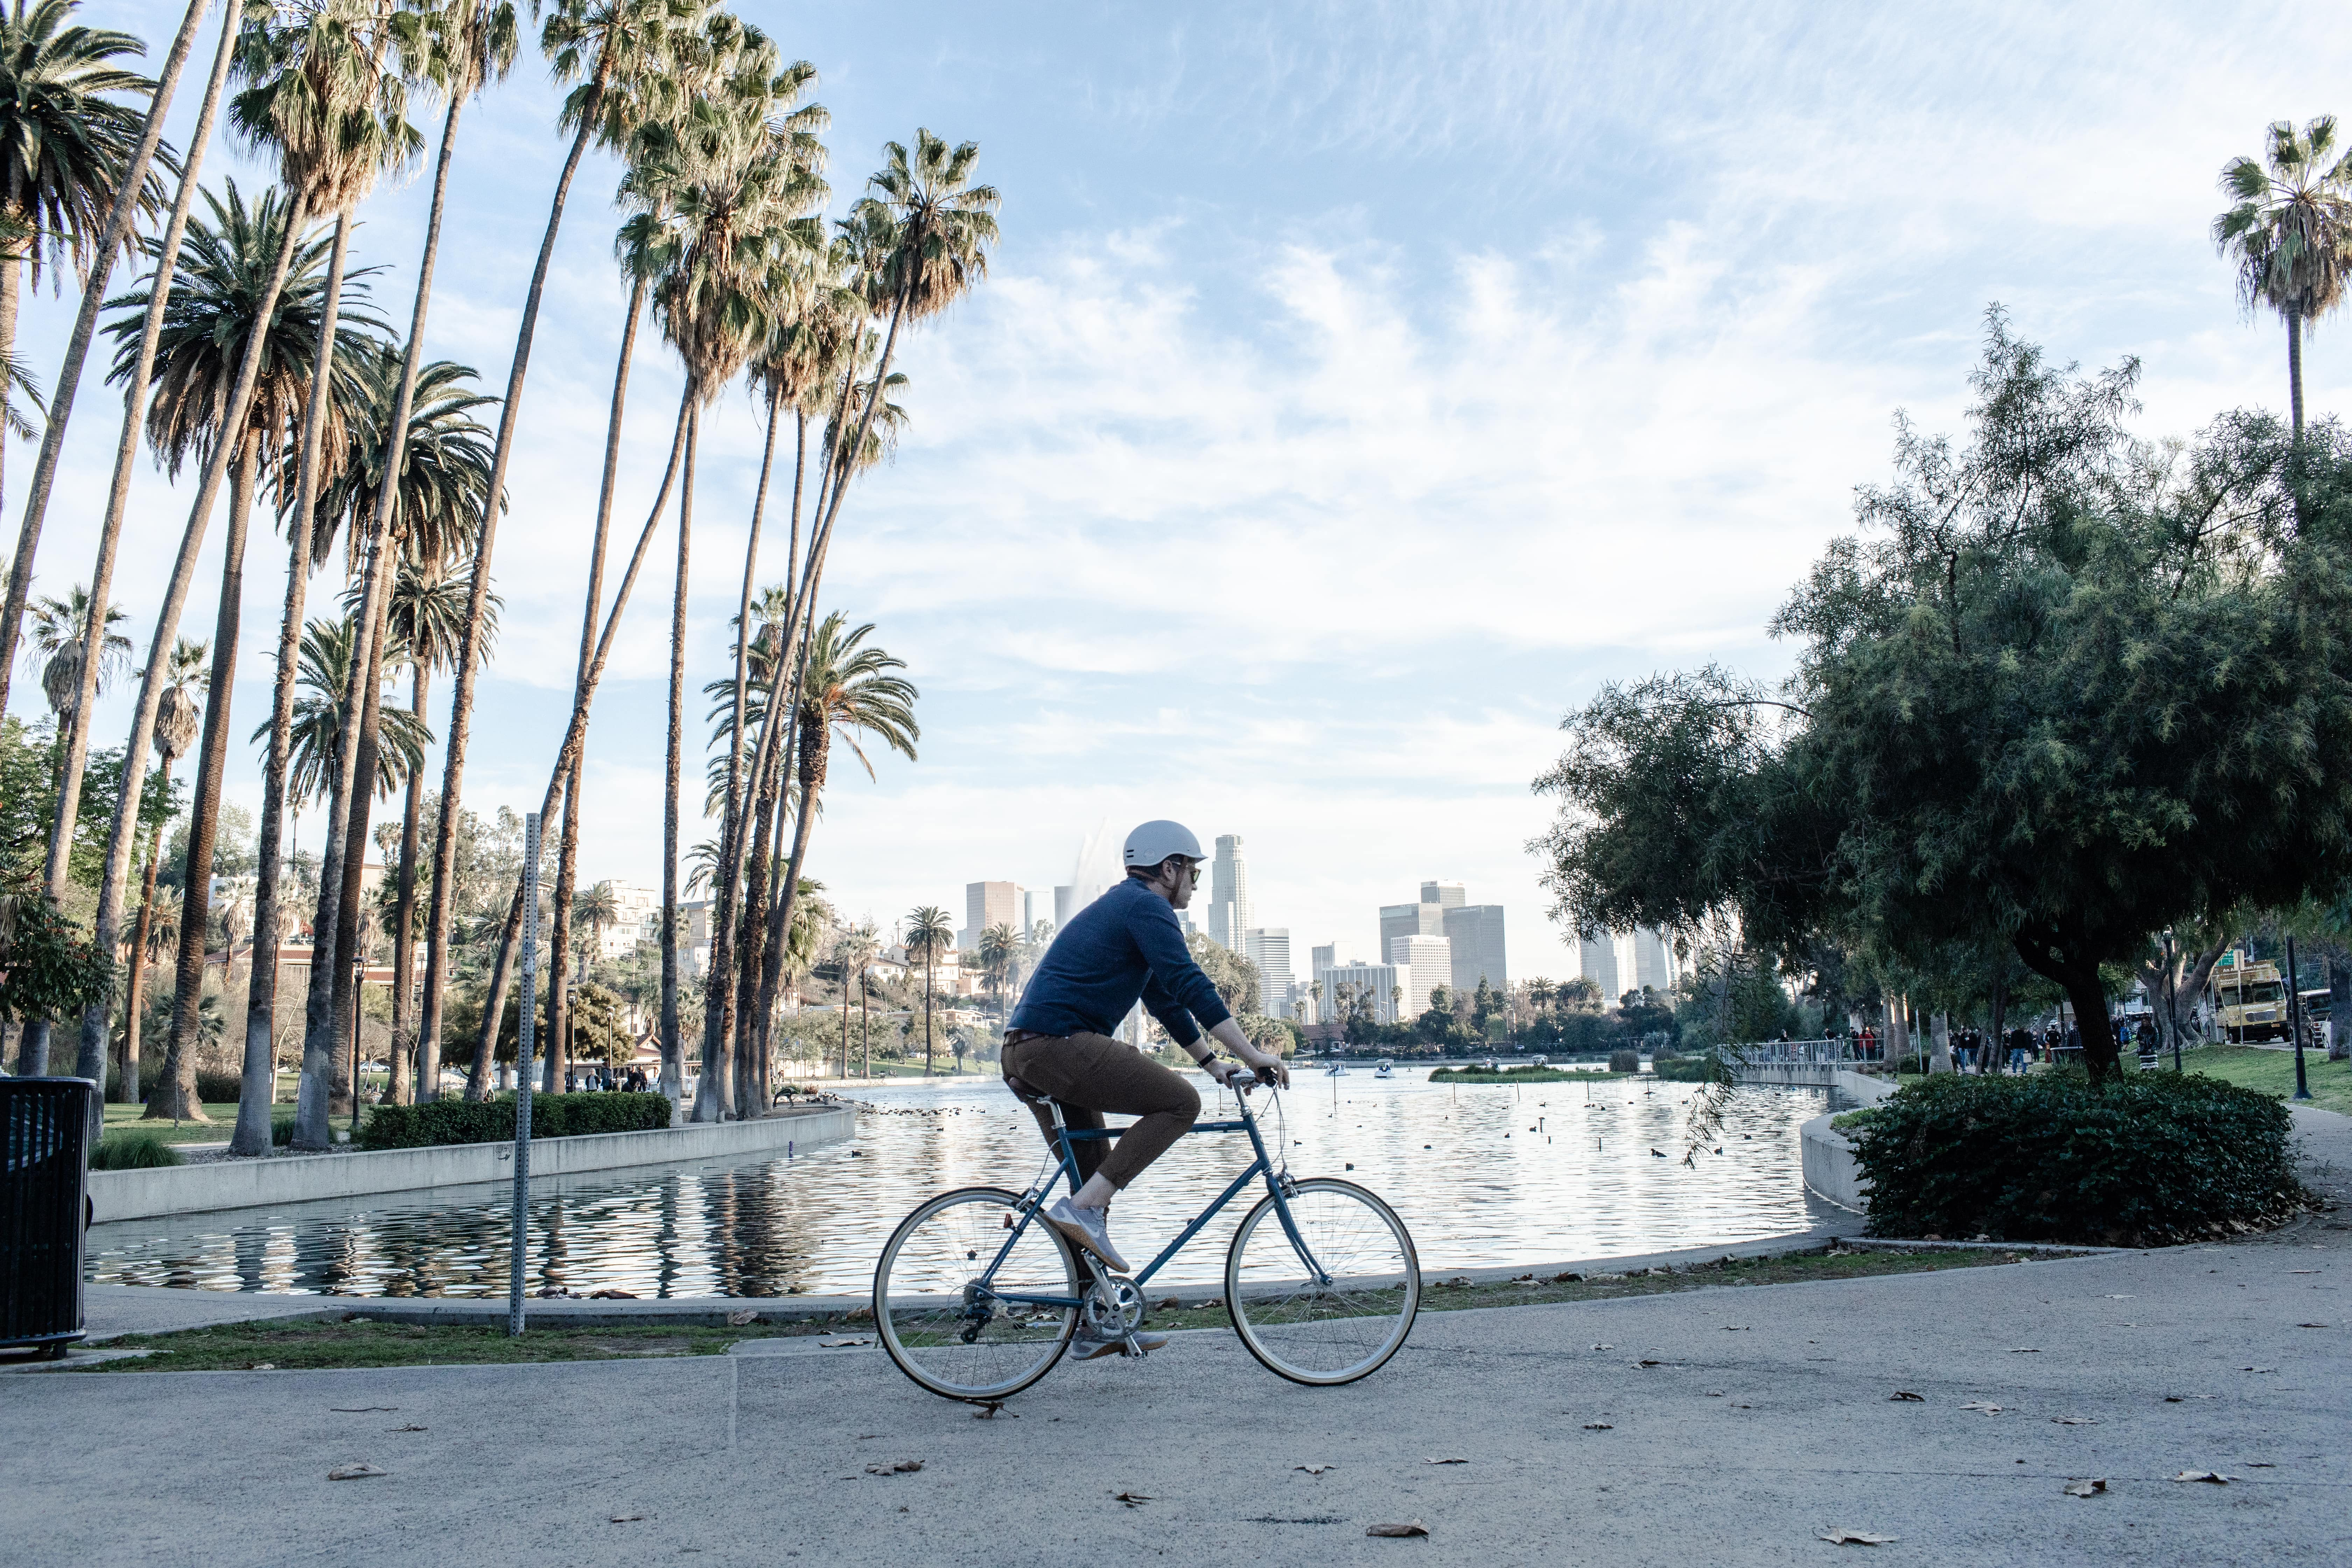 US Bike friendly cities